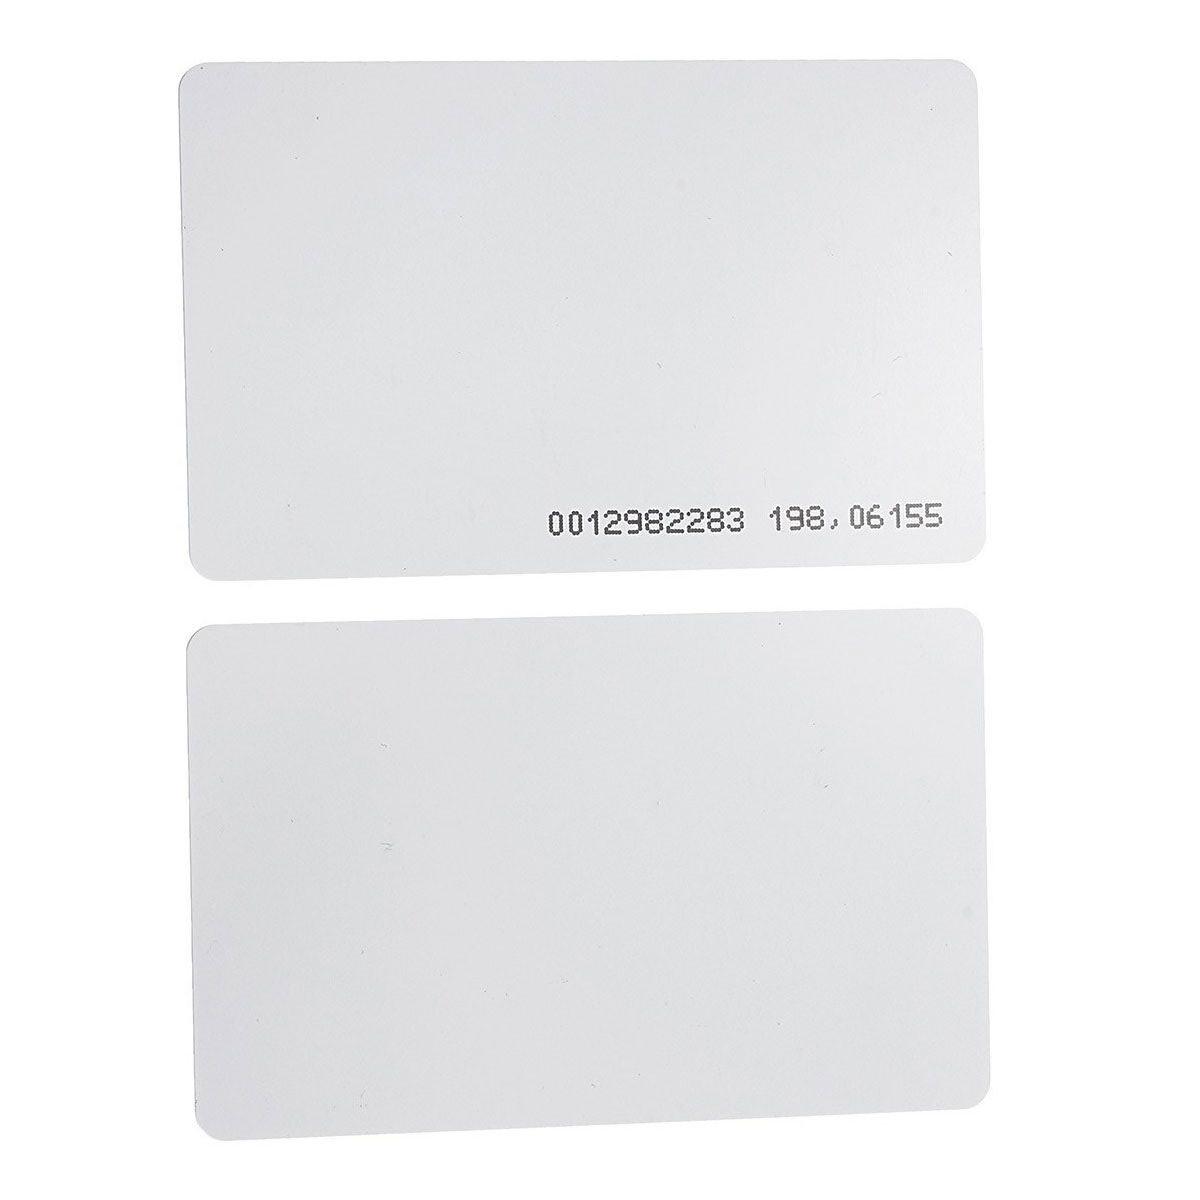 Cartão RFID 125 KHz PVC - 1000 unidades